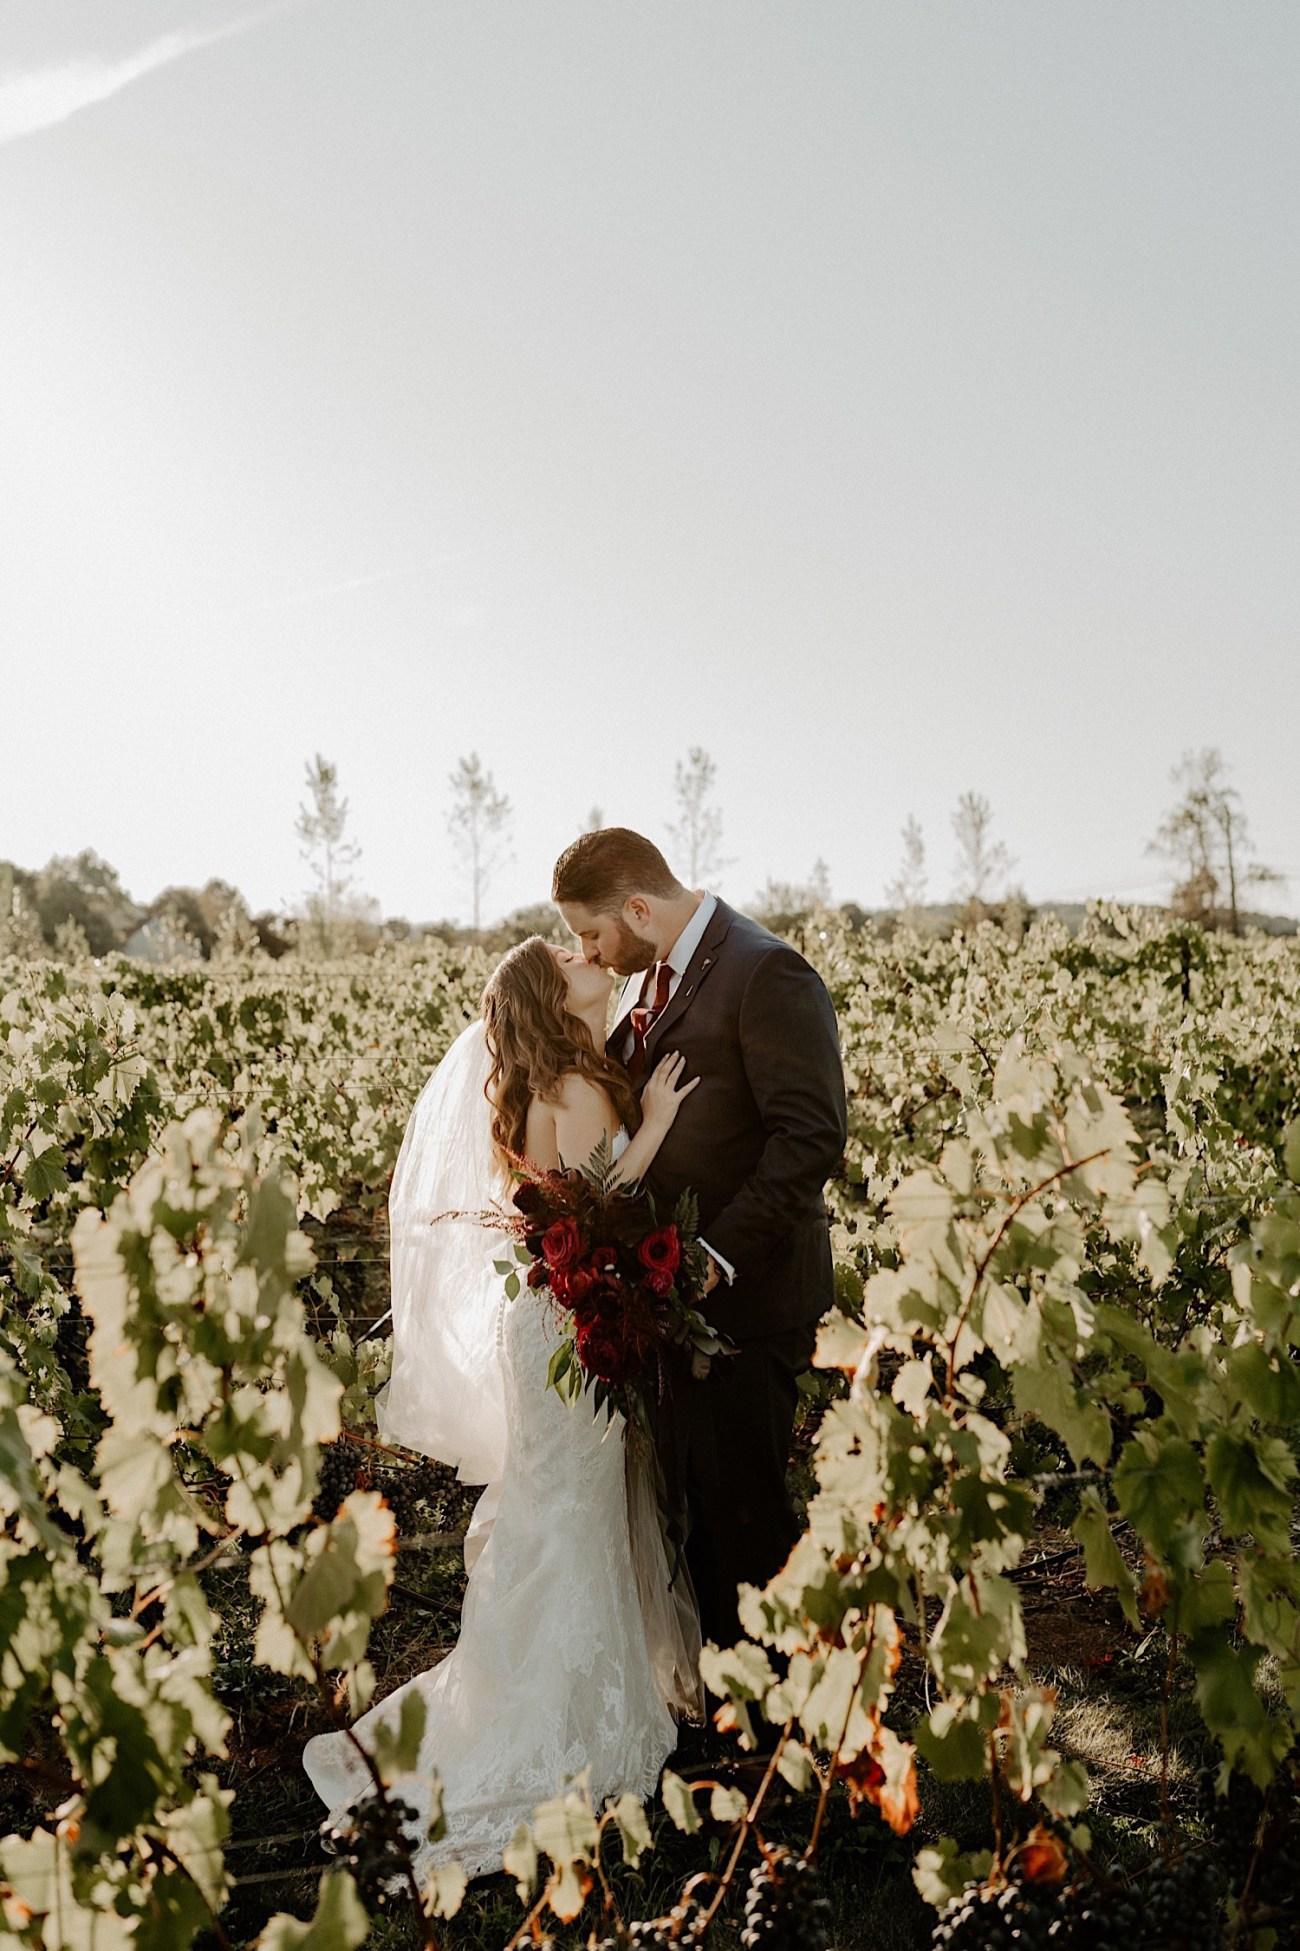 Hopewell Valley Vineyards Wedding New Jersey Wedding Photographer 18